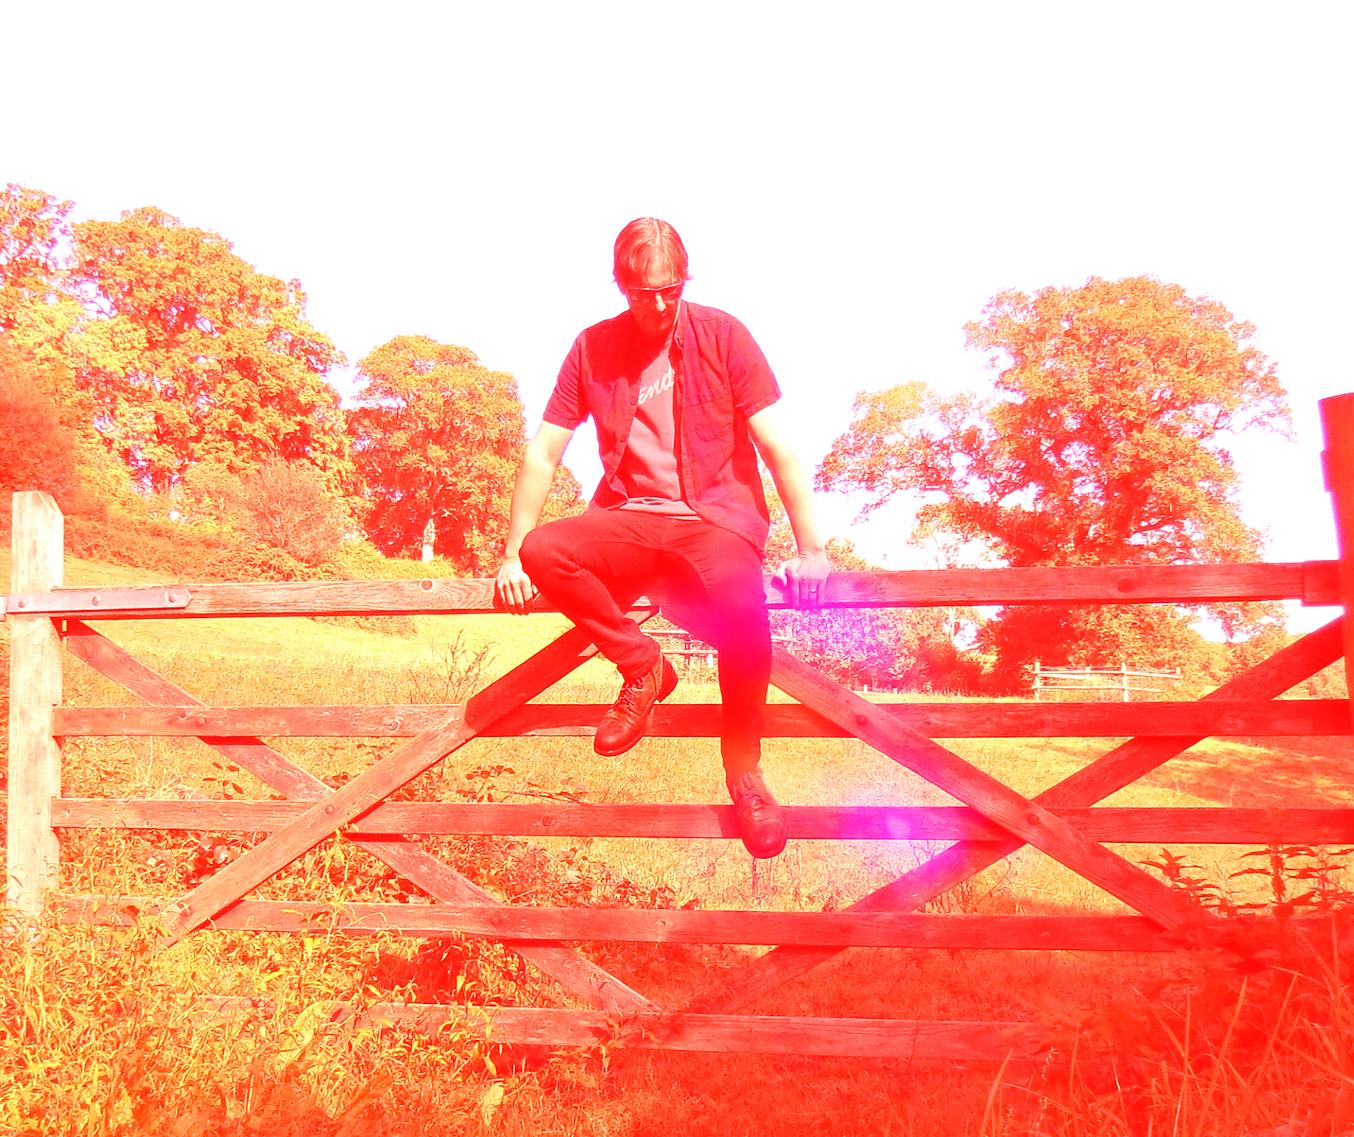 Indigo Daydream-musical-artist-sitting on a gate-Dartington-Devon-daydreaming.png